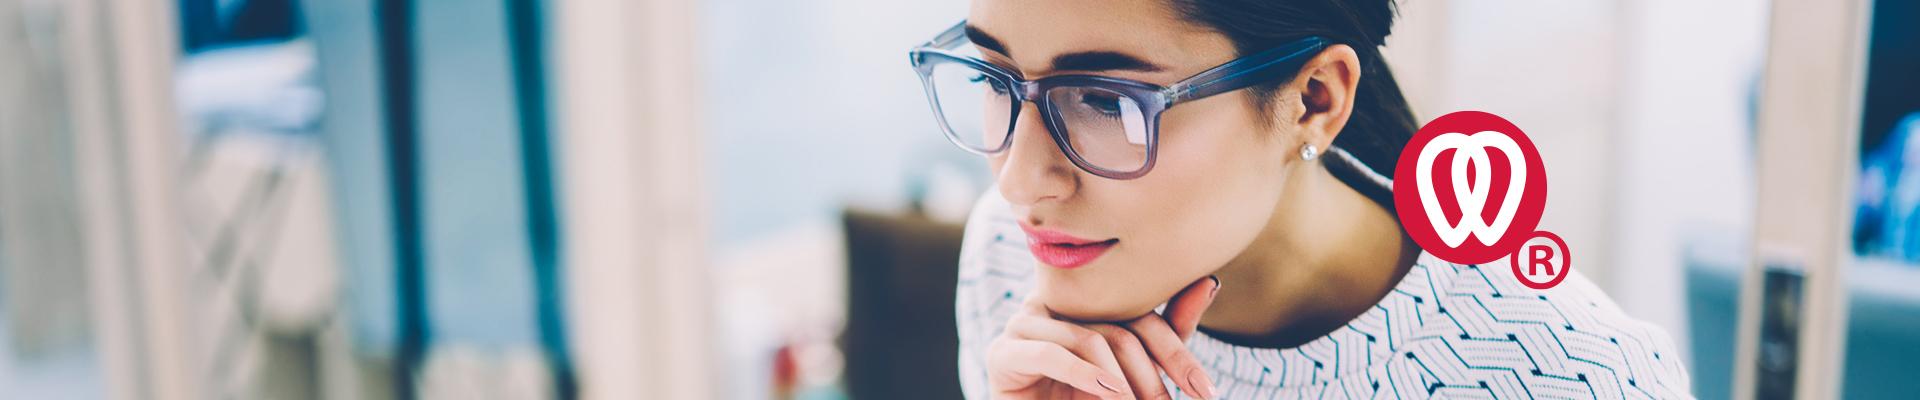 Vrouw met bril Dental-Match